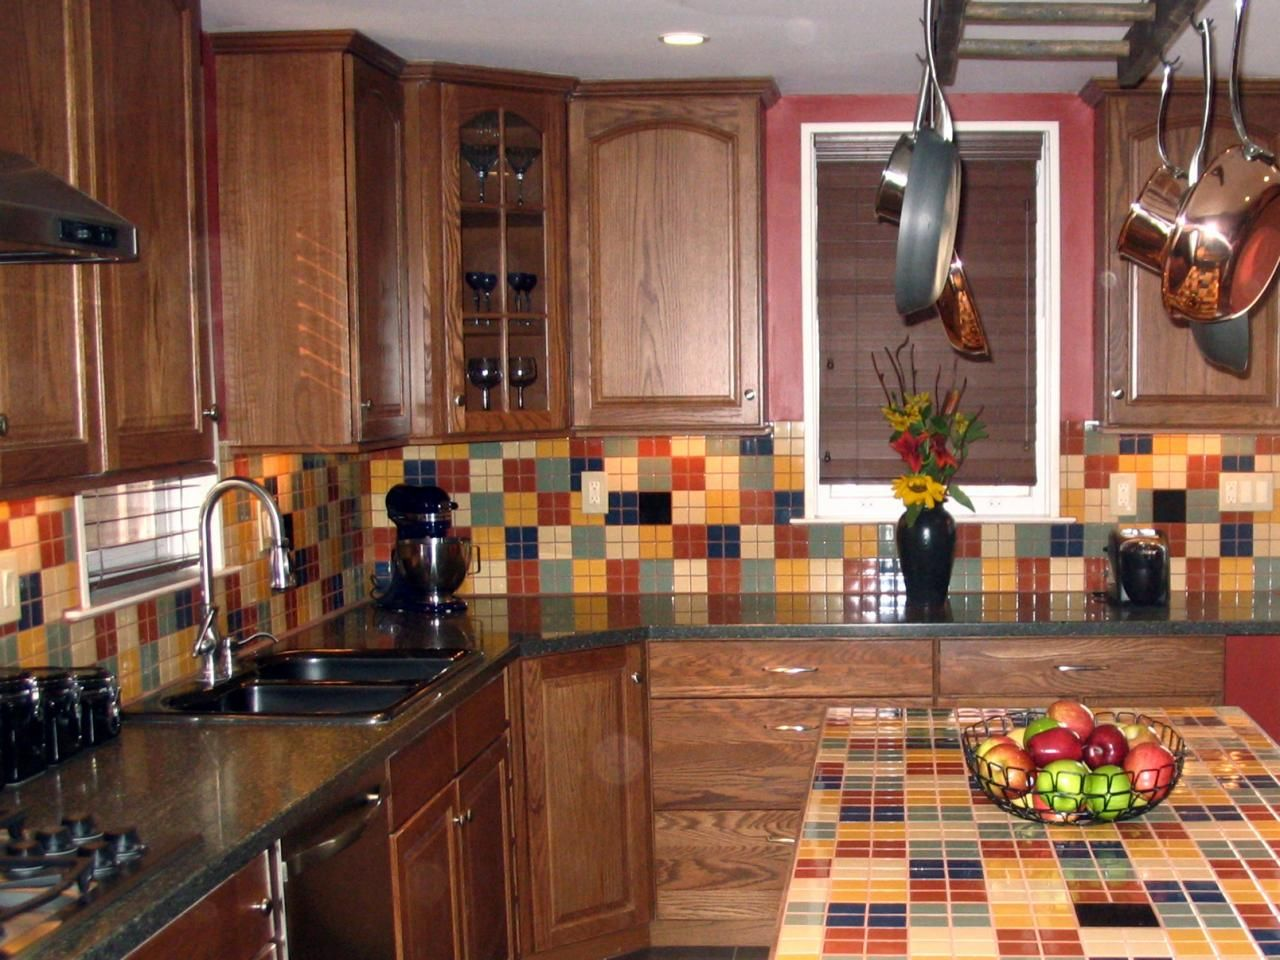 Kitchen backsplash tile ideas kitchen remodel pinterest